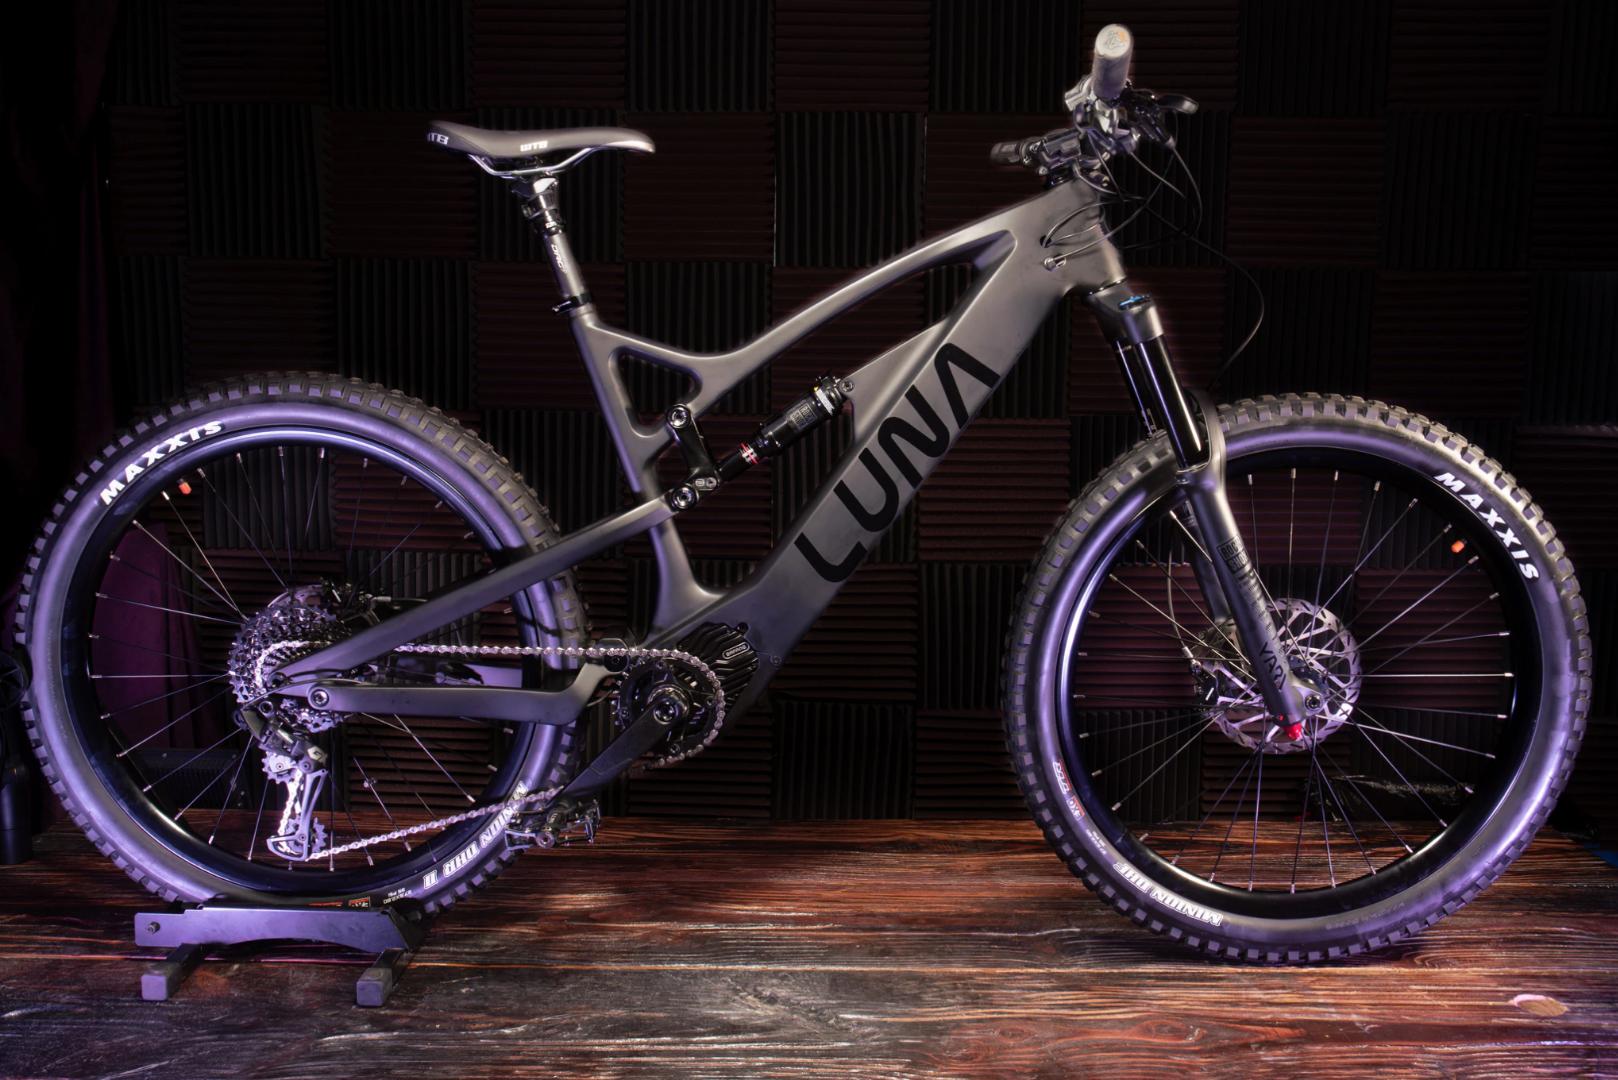 Luna unleashes its affordably insane 2000-watt X-1 Enduro ebike